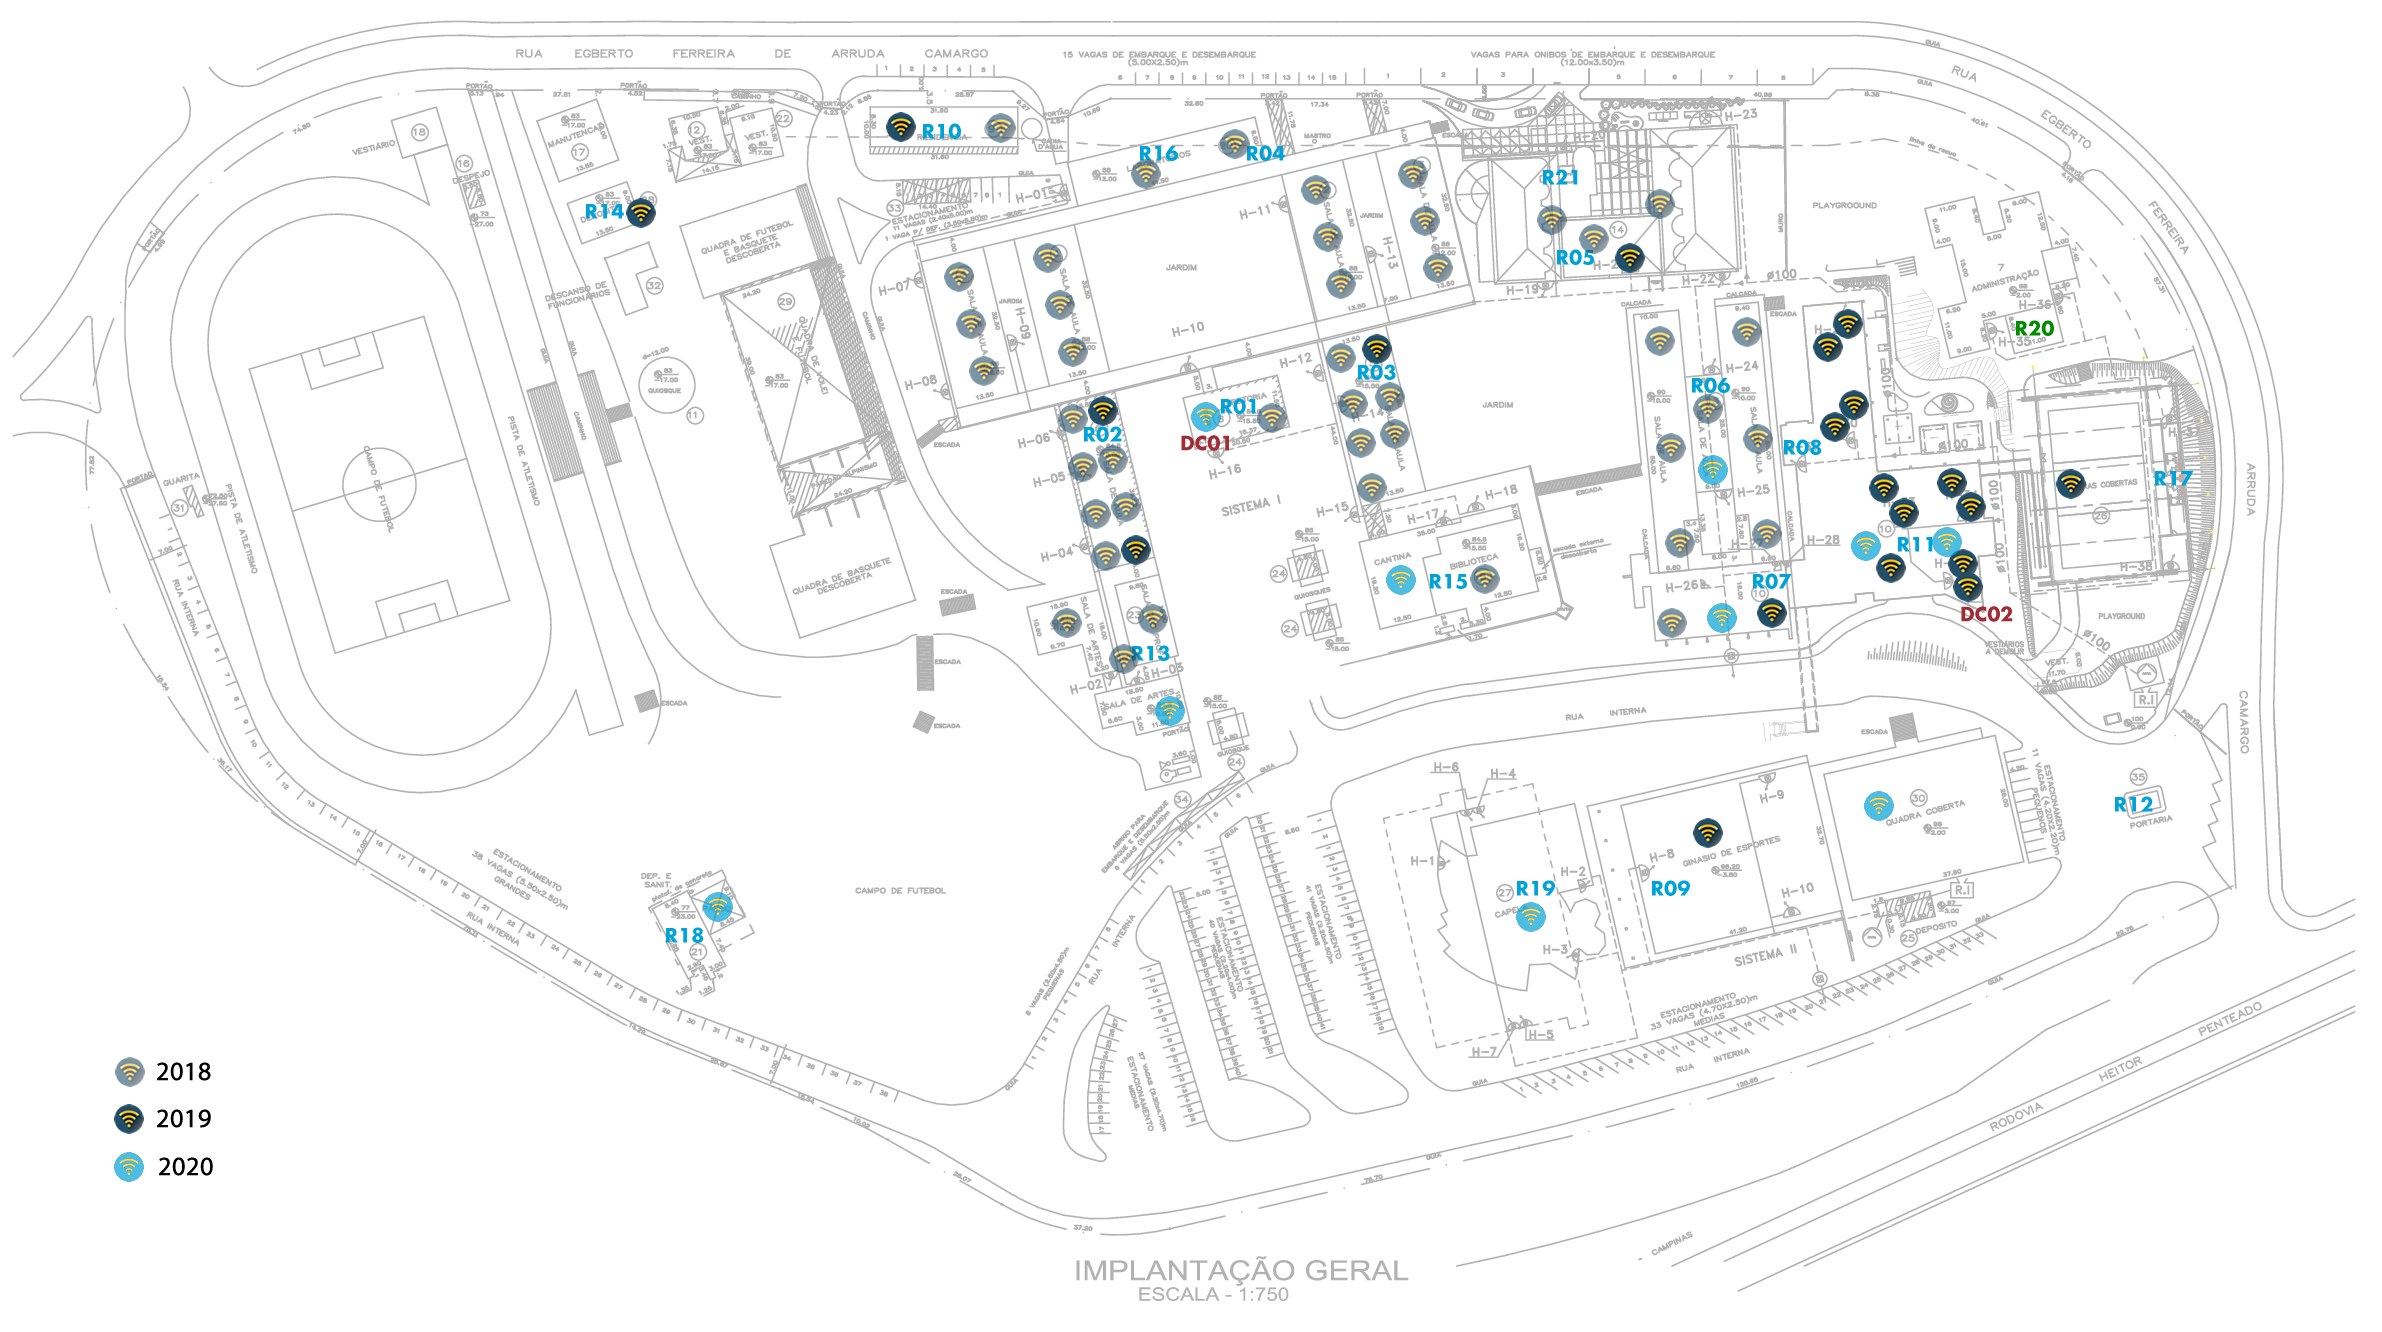 mapa do ambiente wi-fi